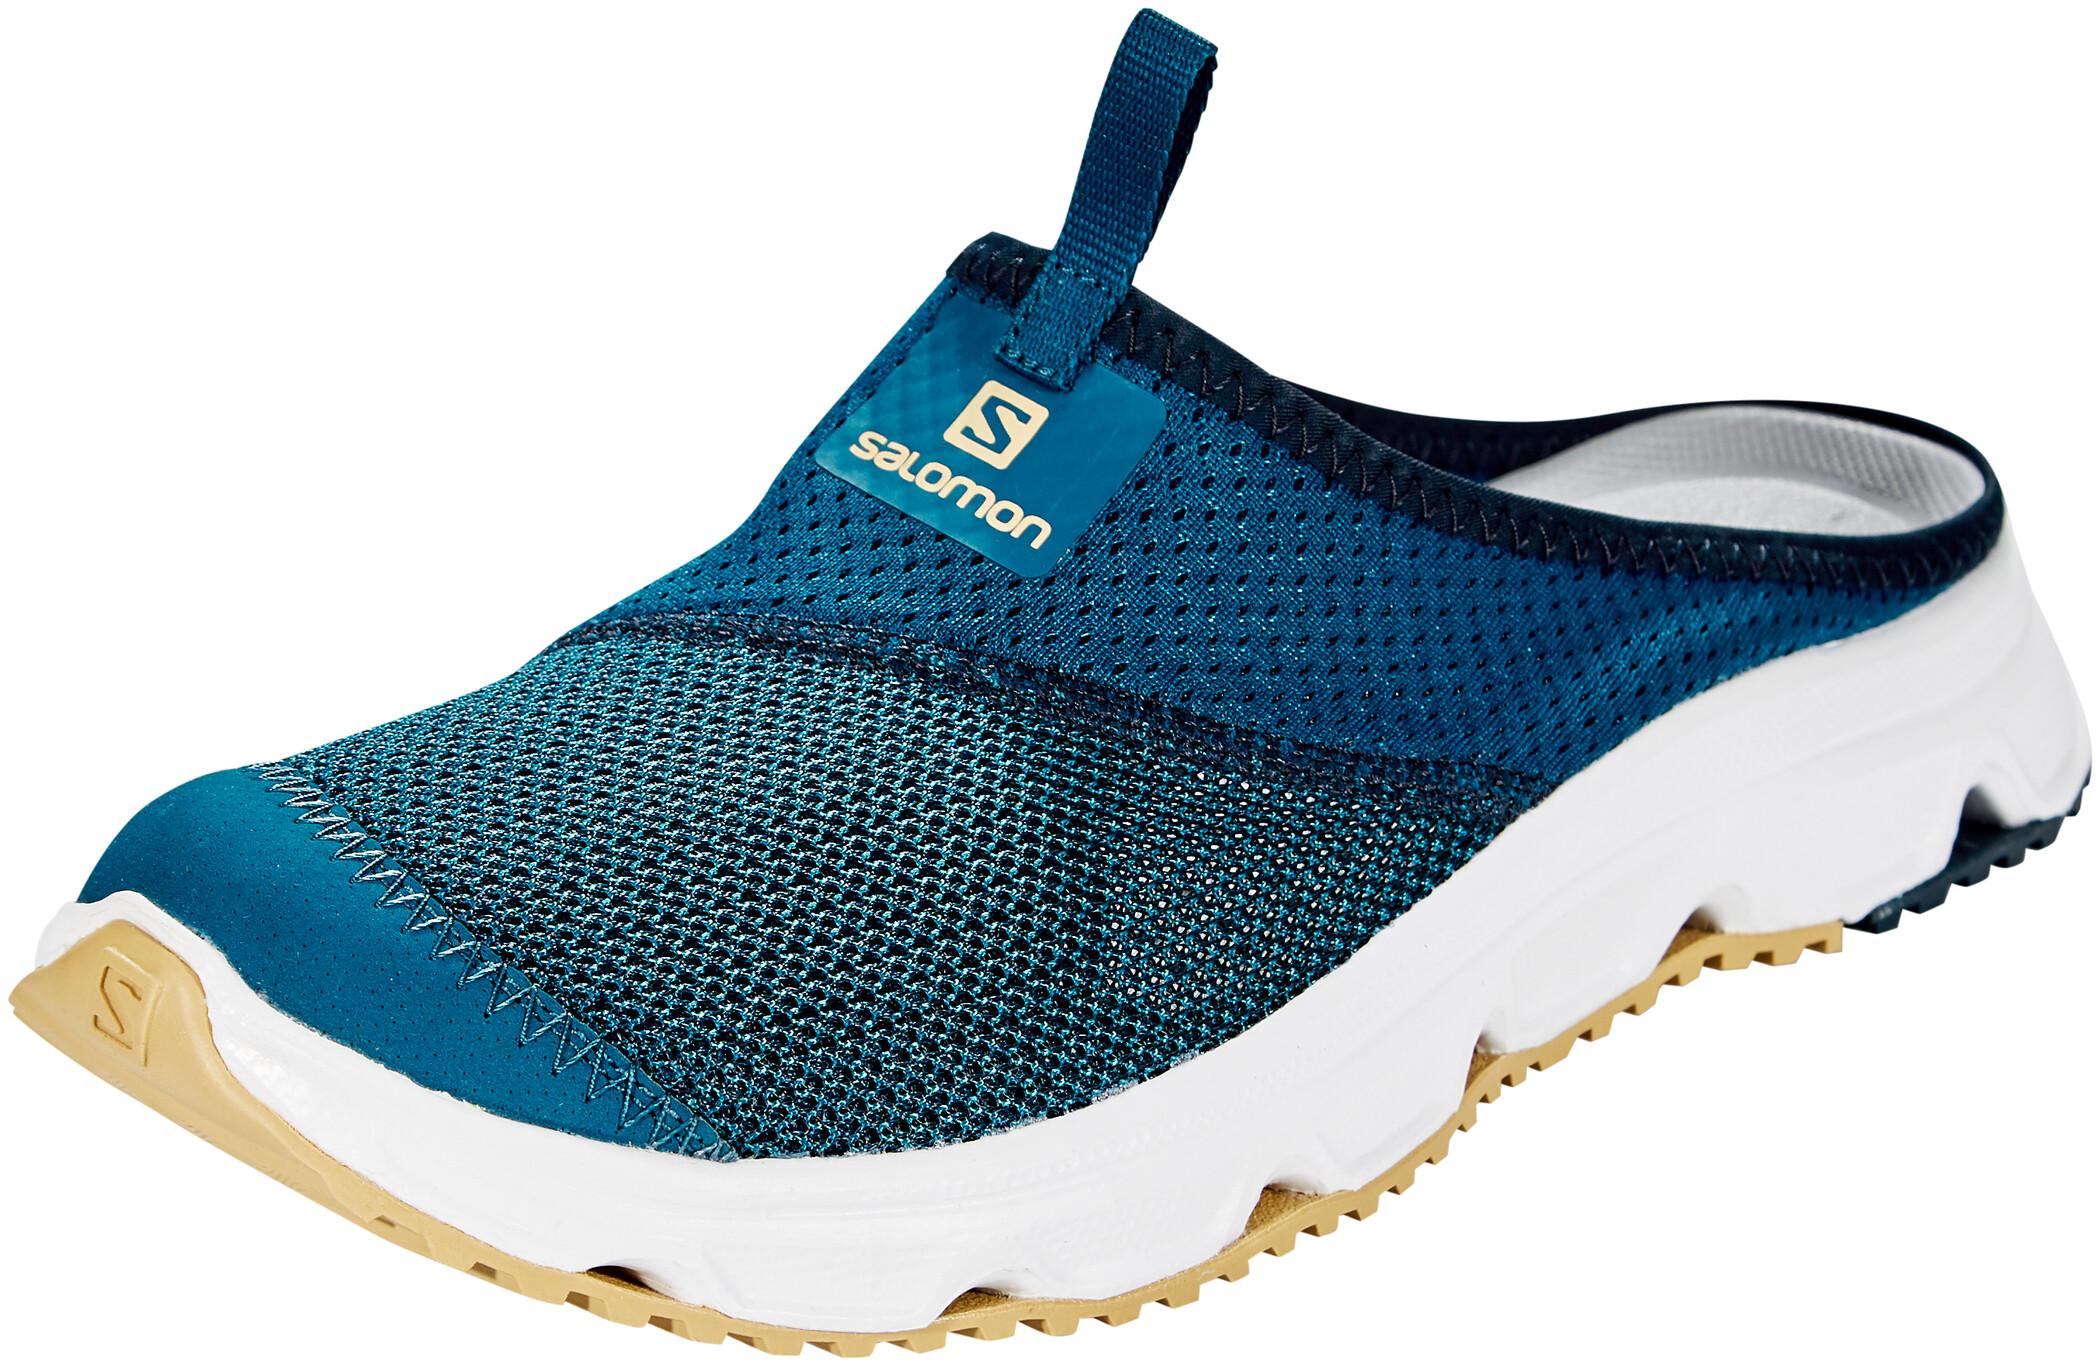 Salomon RX Slide 4.0 Shoes Herr poseidonnavy blazertaos taupe